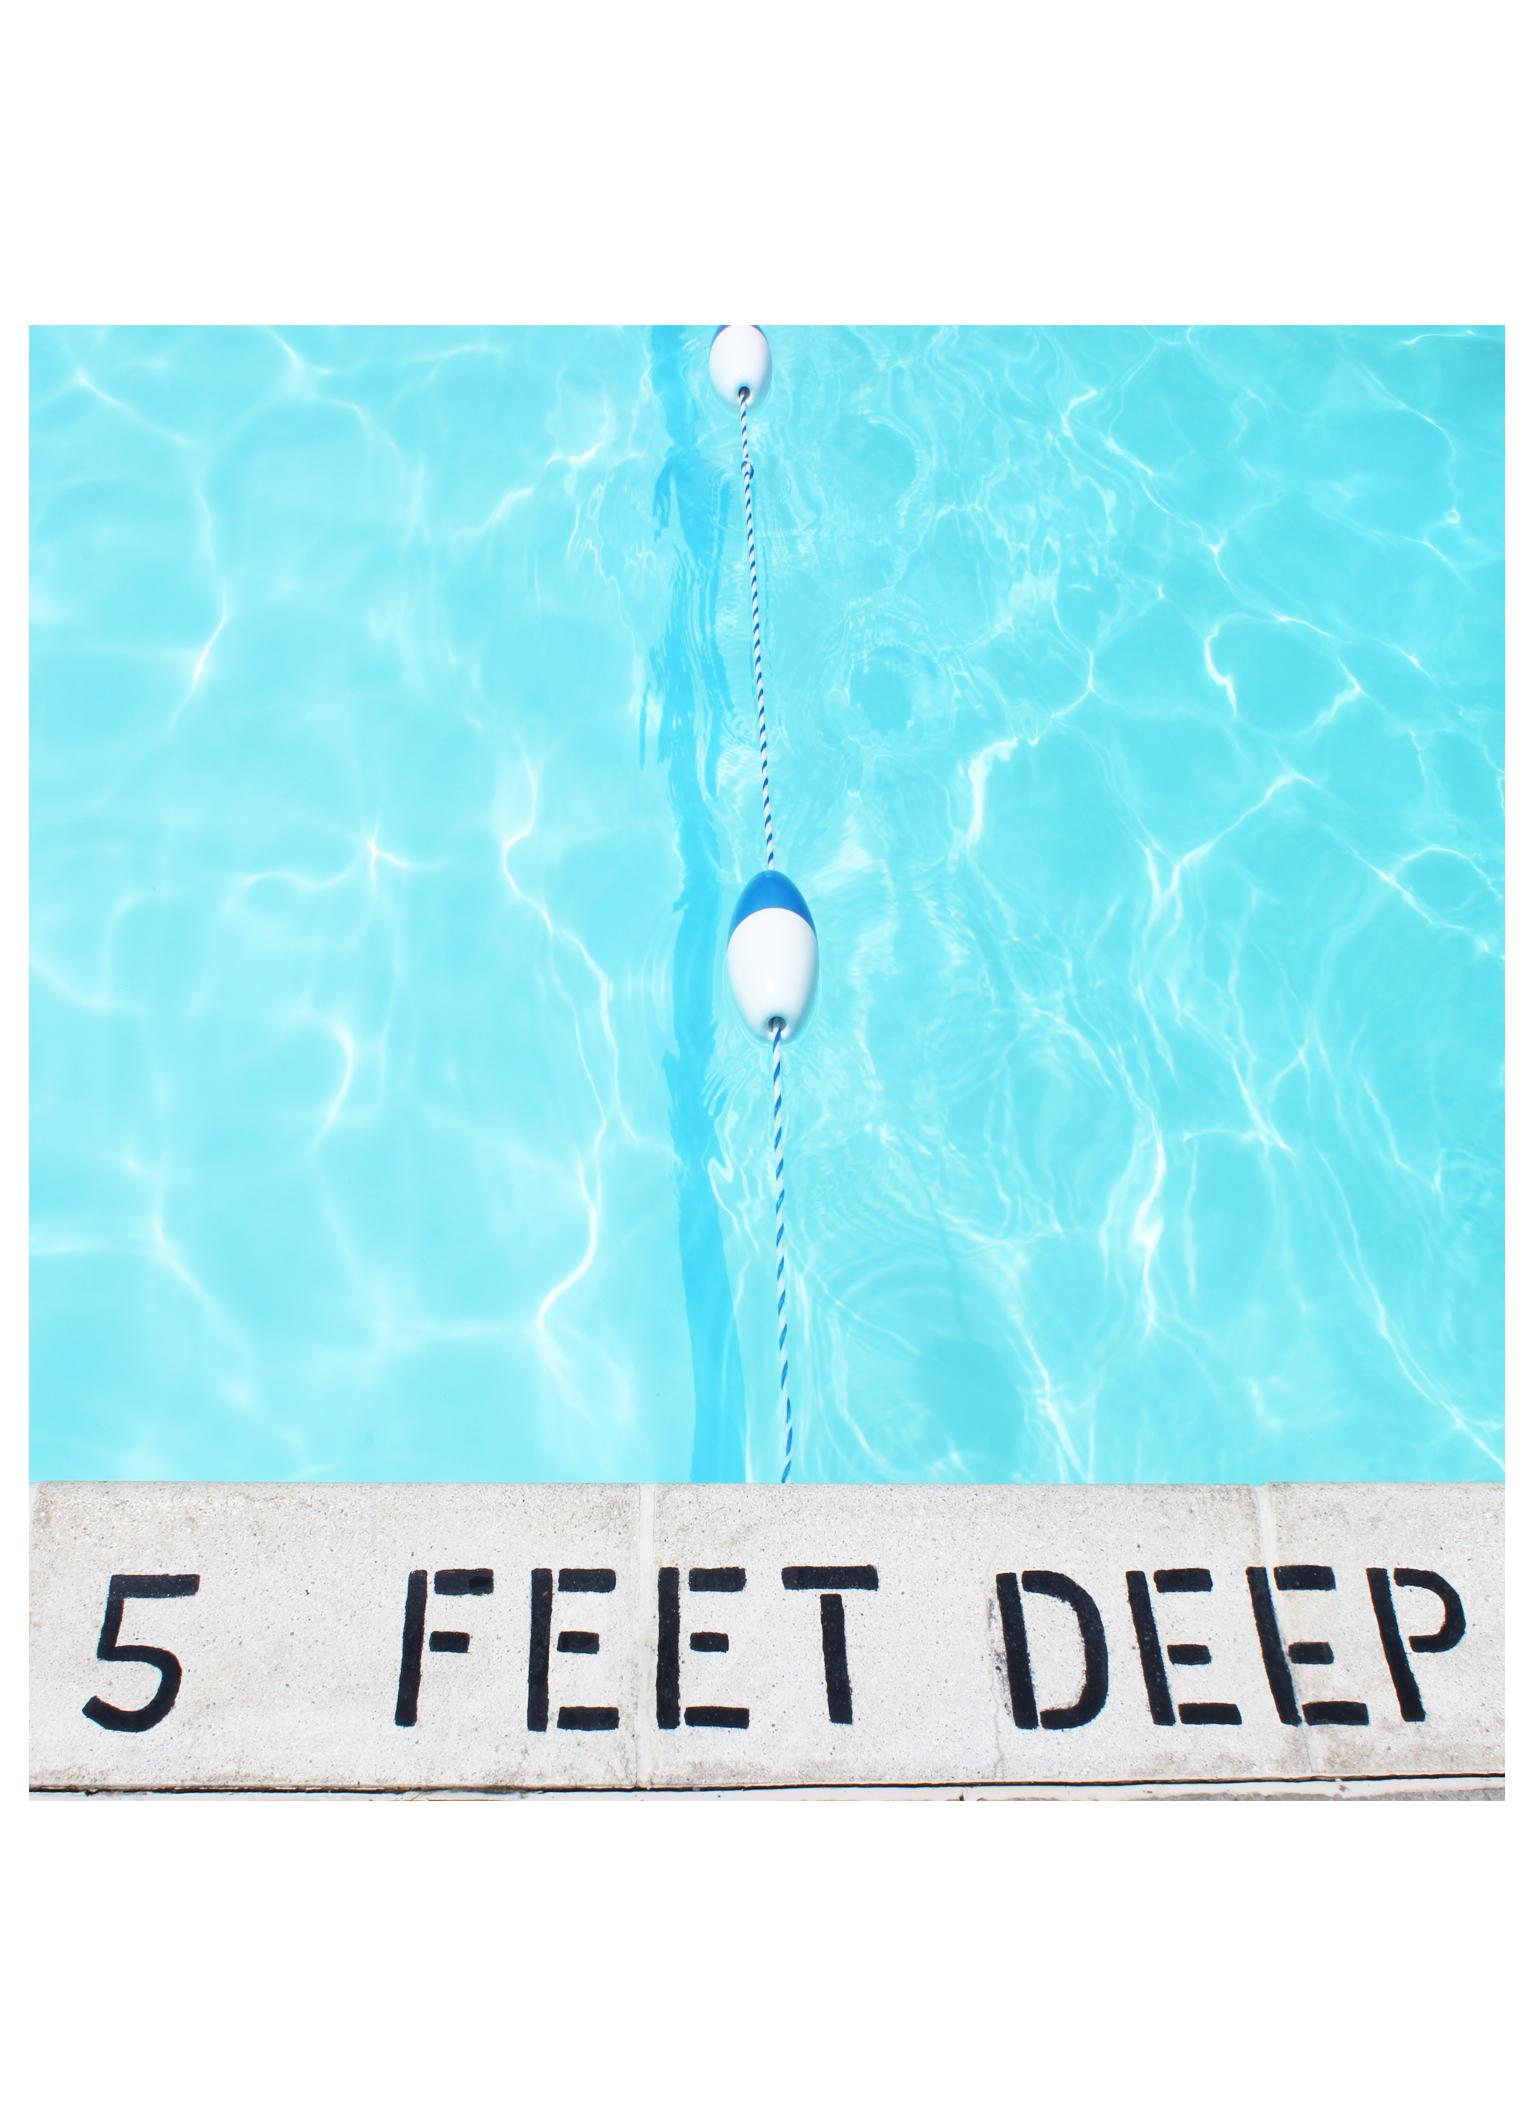 5 feet deep